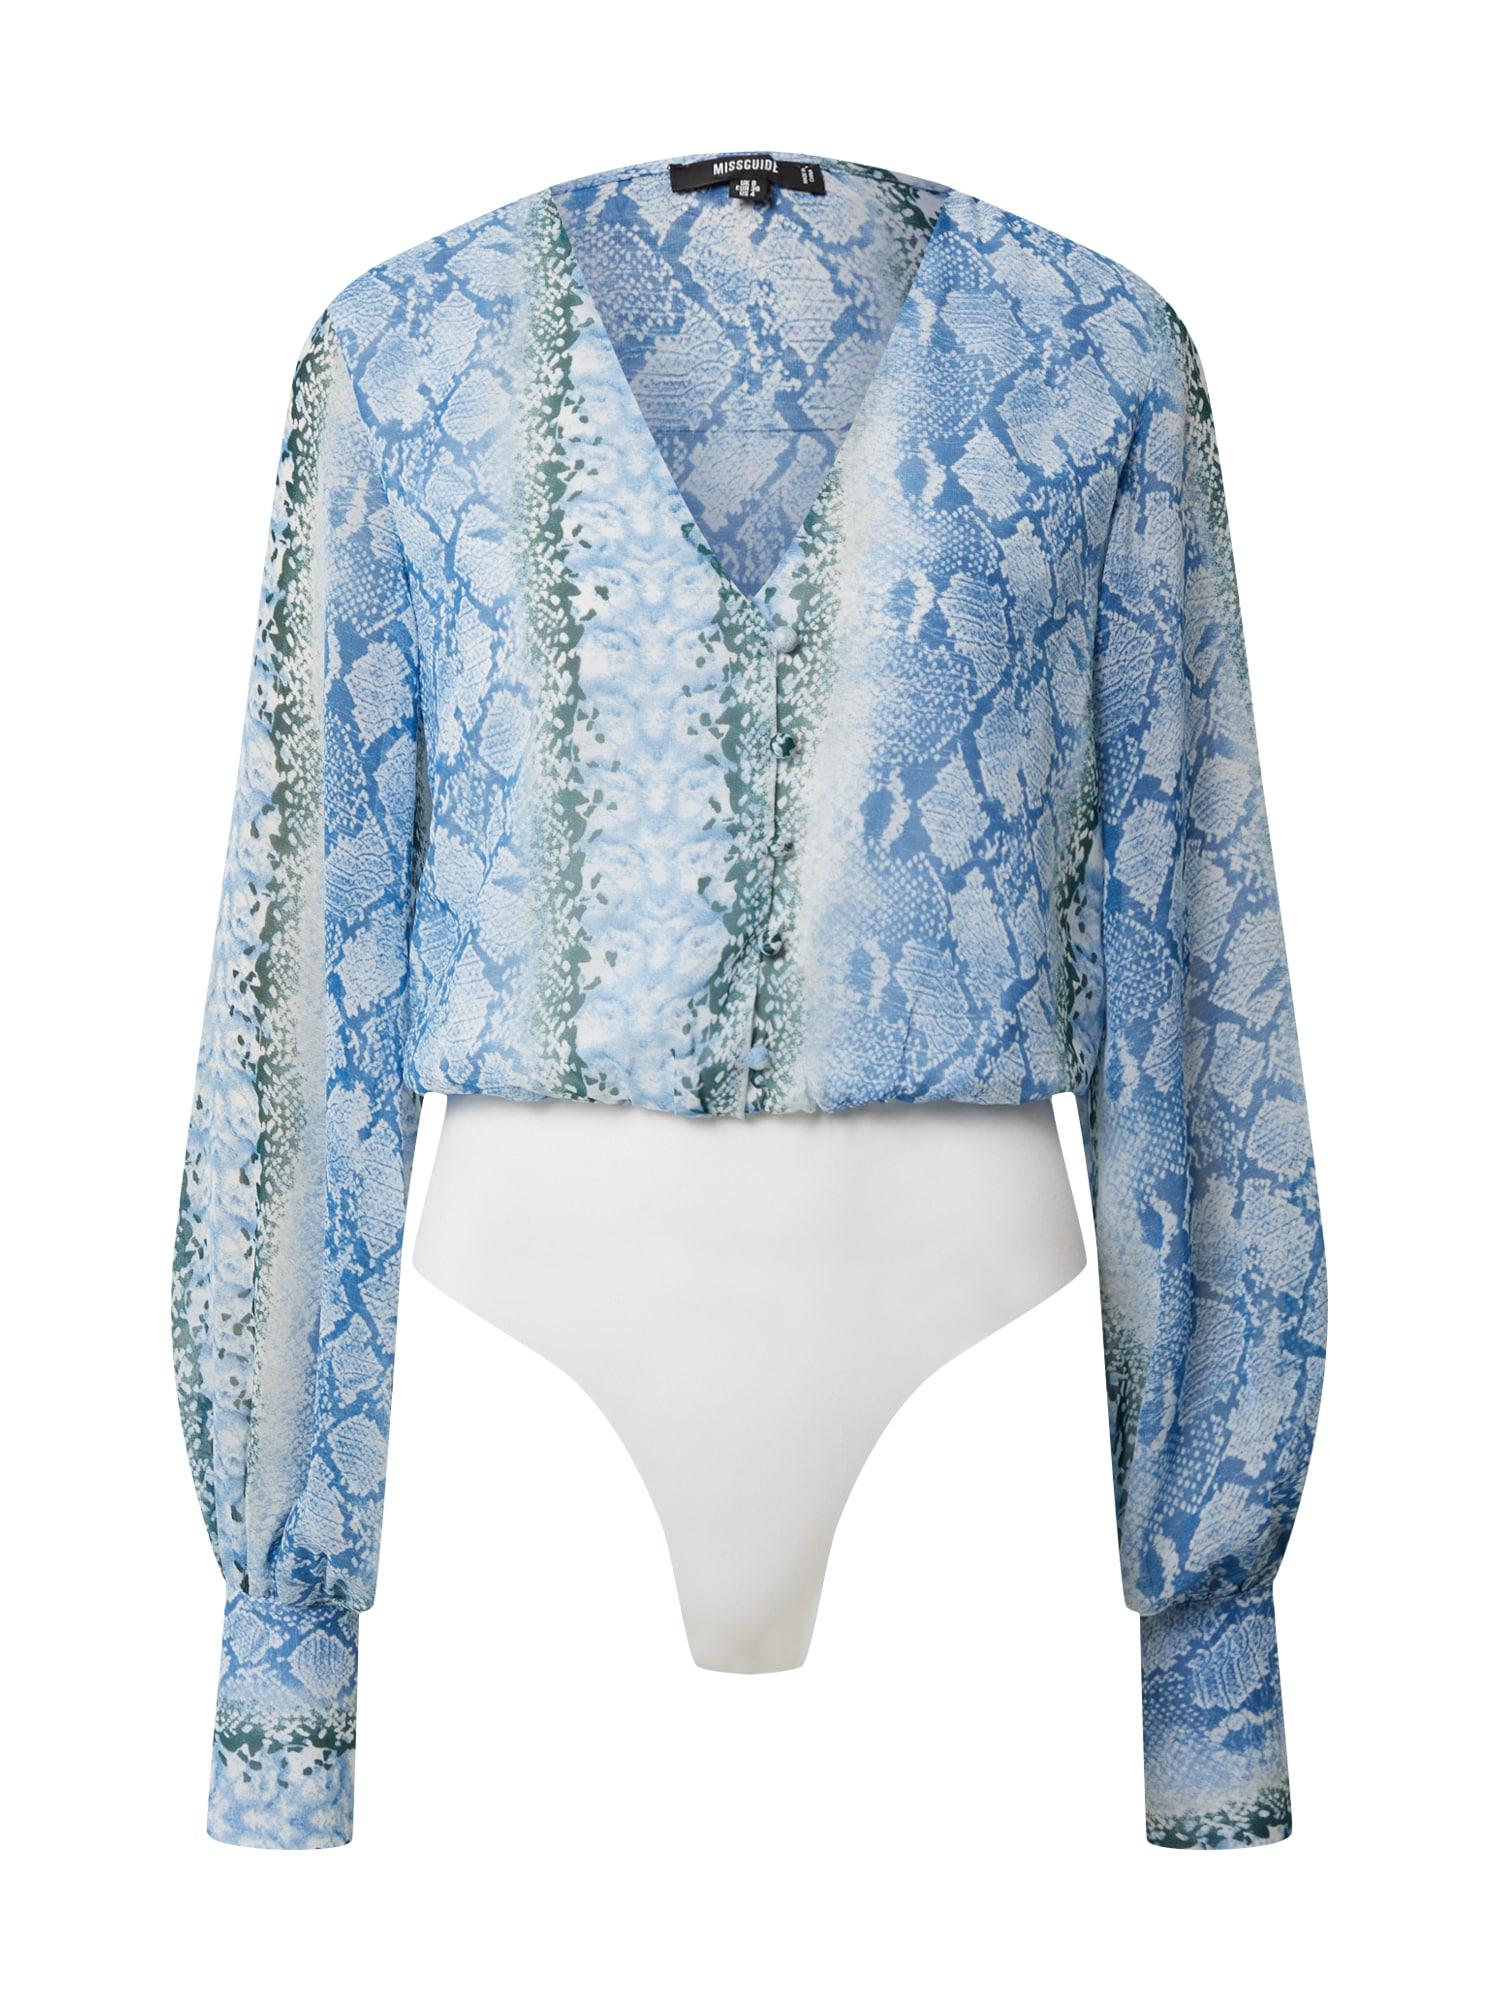 Missguided Marškinėliai-glaustinukė 'FLORAL CHIFFON BUTTON FRNT LONG SLV BODY' balta / mėlyna / tamsiai žalia